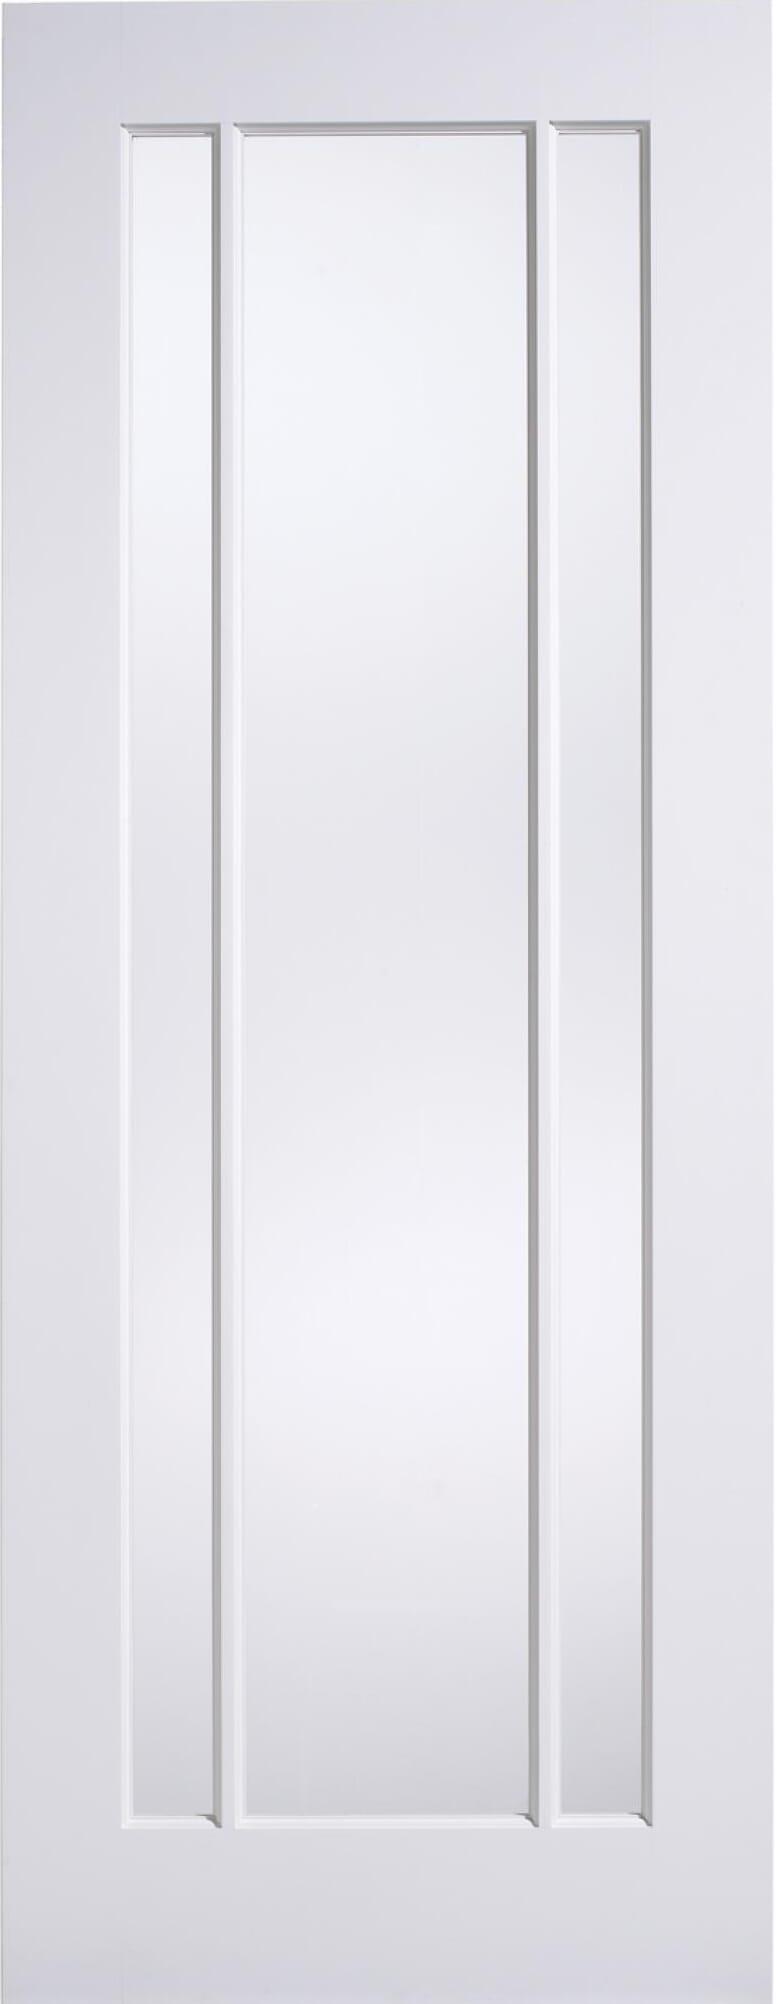 Lincoln Glazed White Image